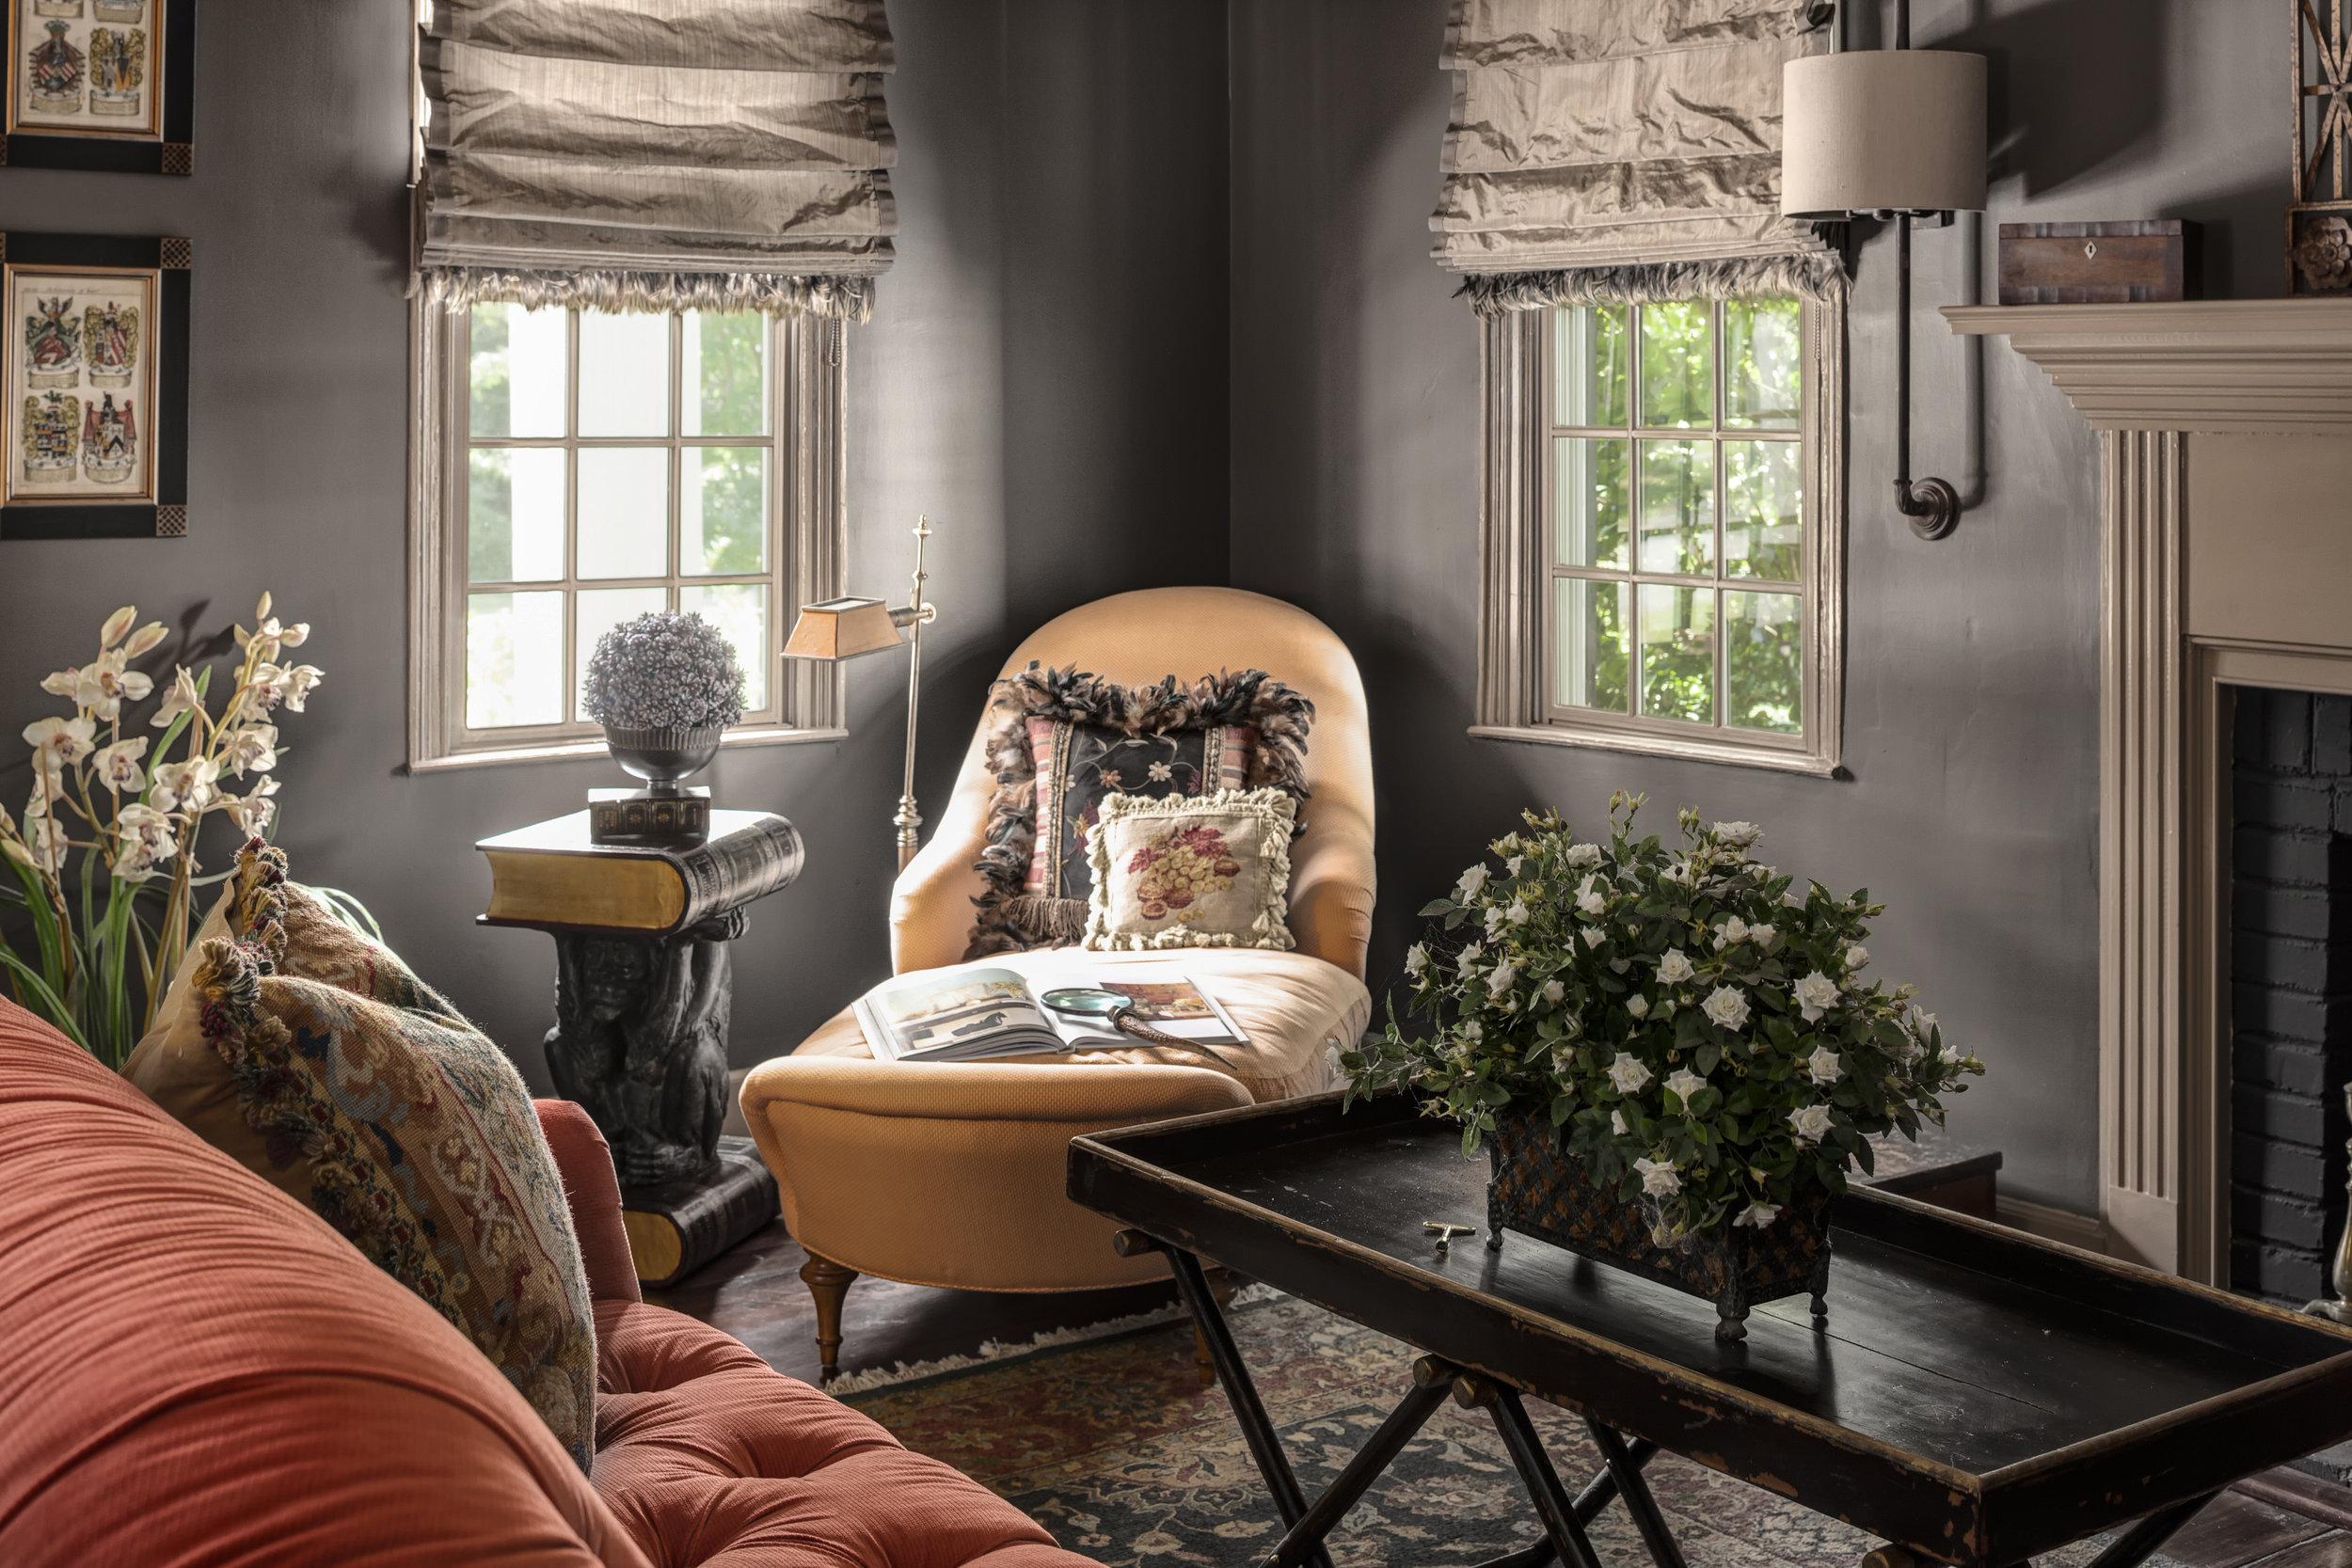 Interior_04_Parlor.jpg